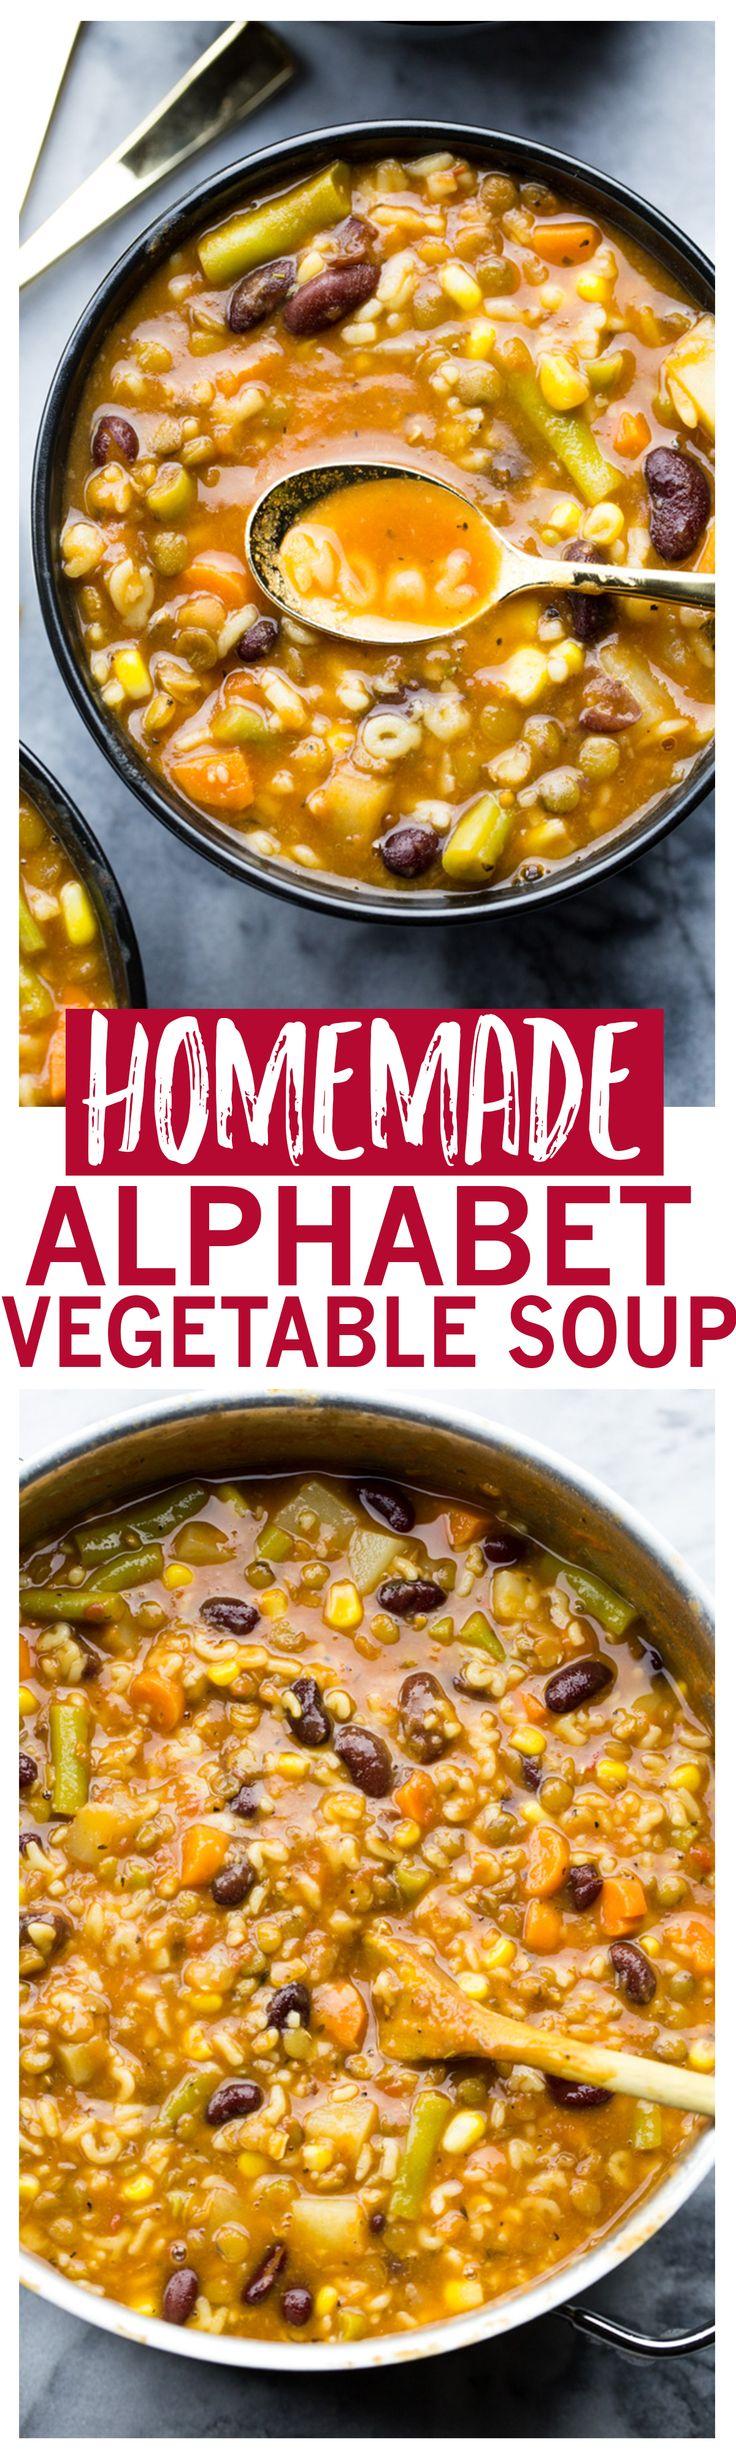 Homemade Alphabet Vegetable Soup   Hearty, vegan, freezer-friendly